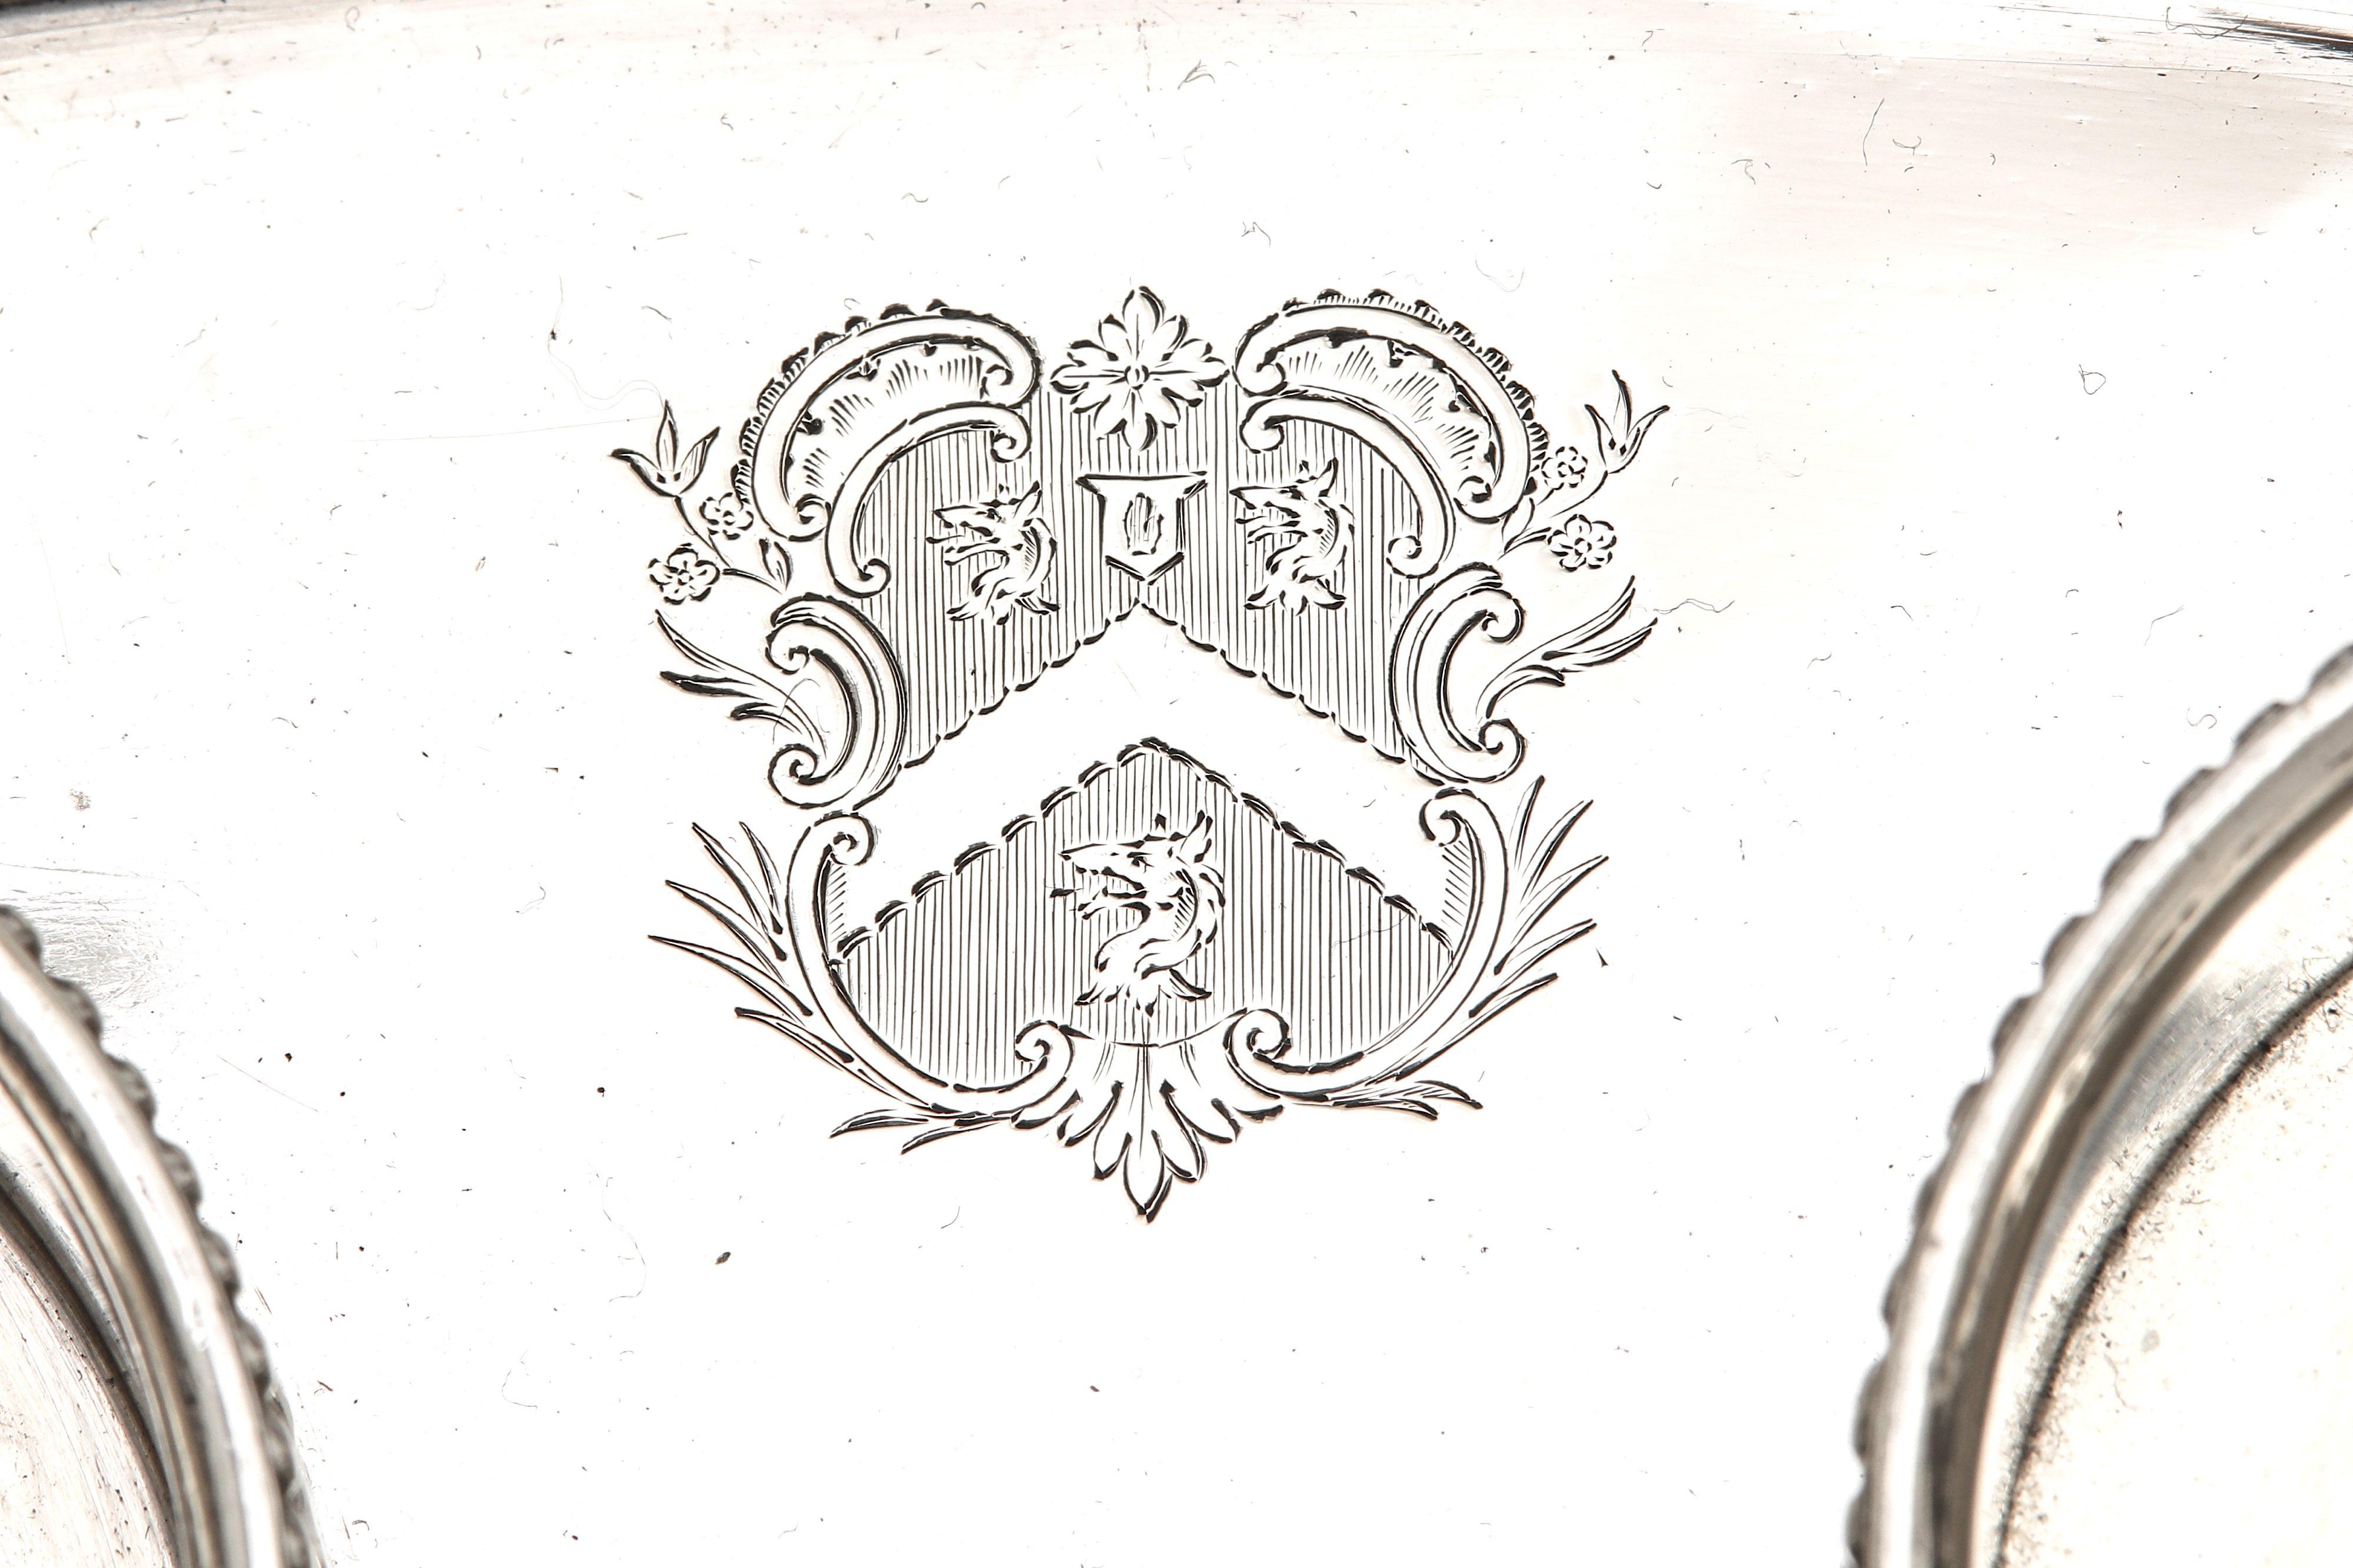 Lot 42 - A George III sterling silver oil and vinegar cruet base, London 1775 by Peter Desvignes (reg. 26th J